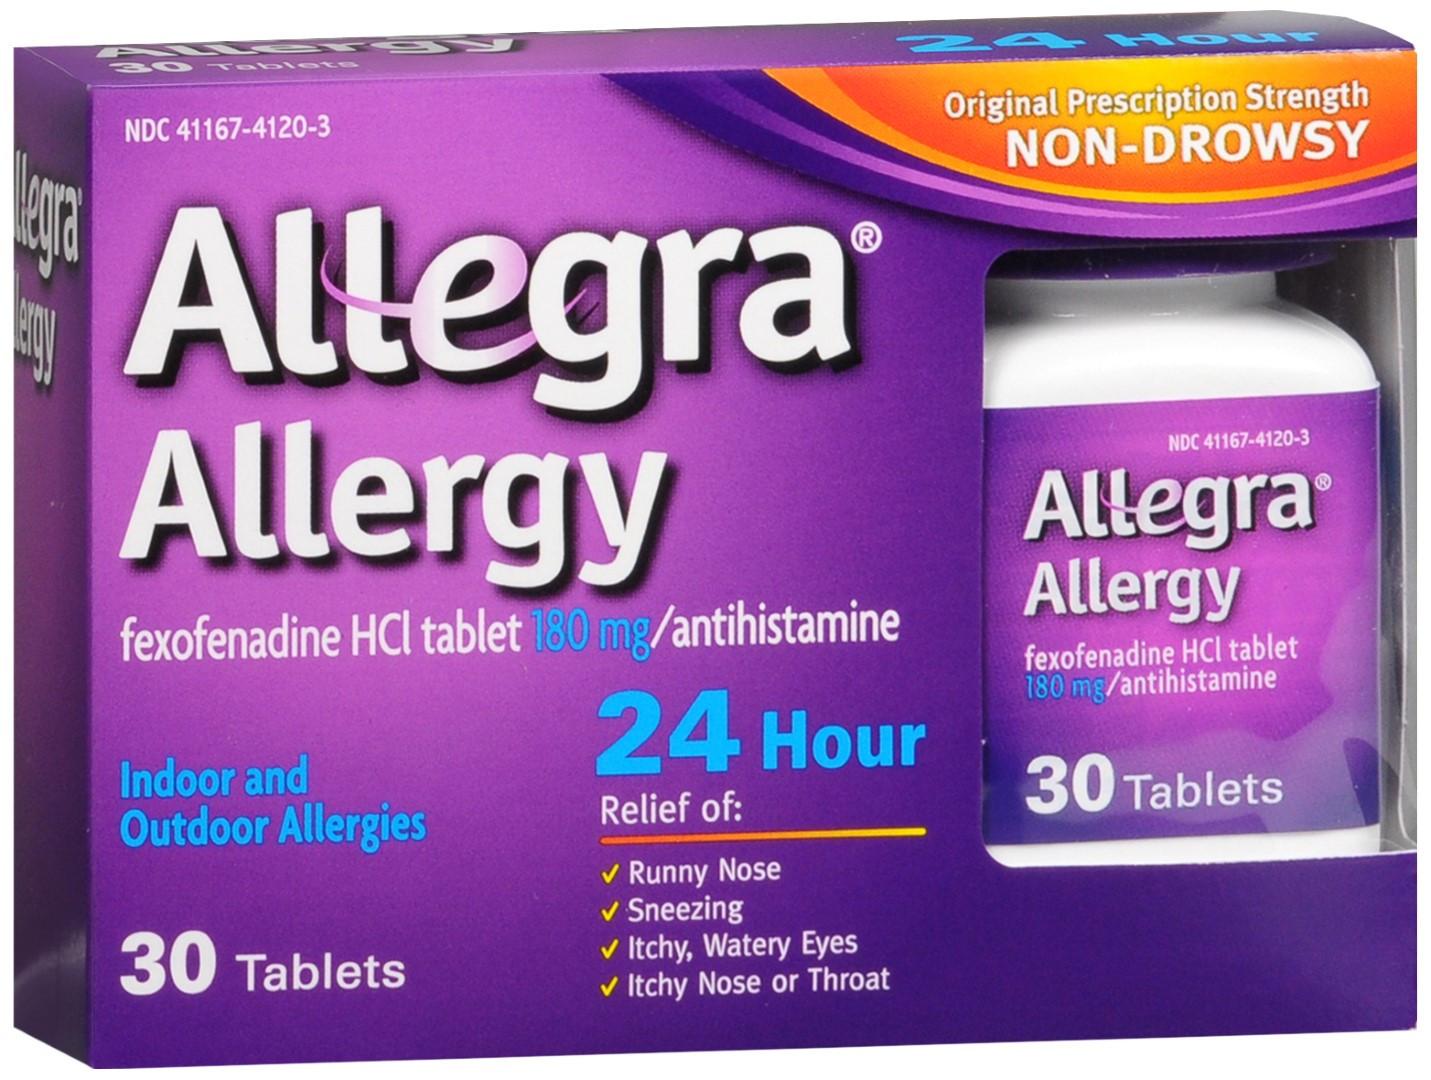 Fexofenadine hcl 180 mg 24 hour.doc - Allegra Allergy 180 Mg Tablets 24 Hour